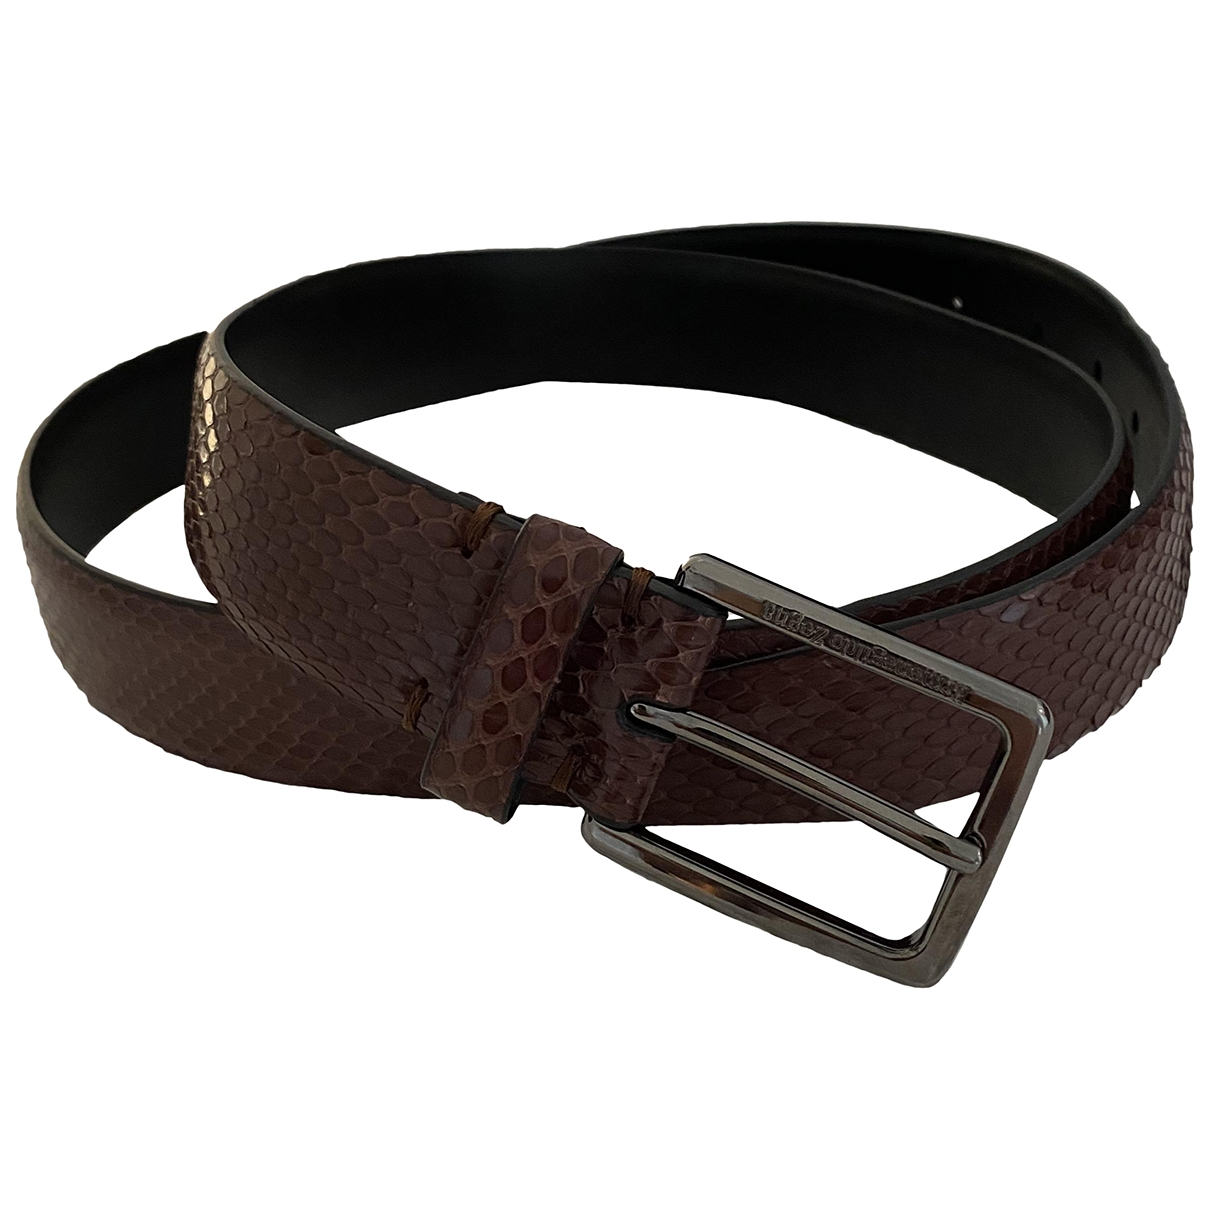 Cinturon de Piton Ermenegildo Zegna